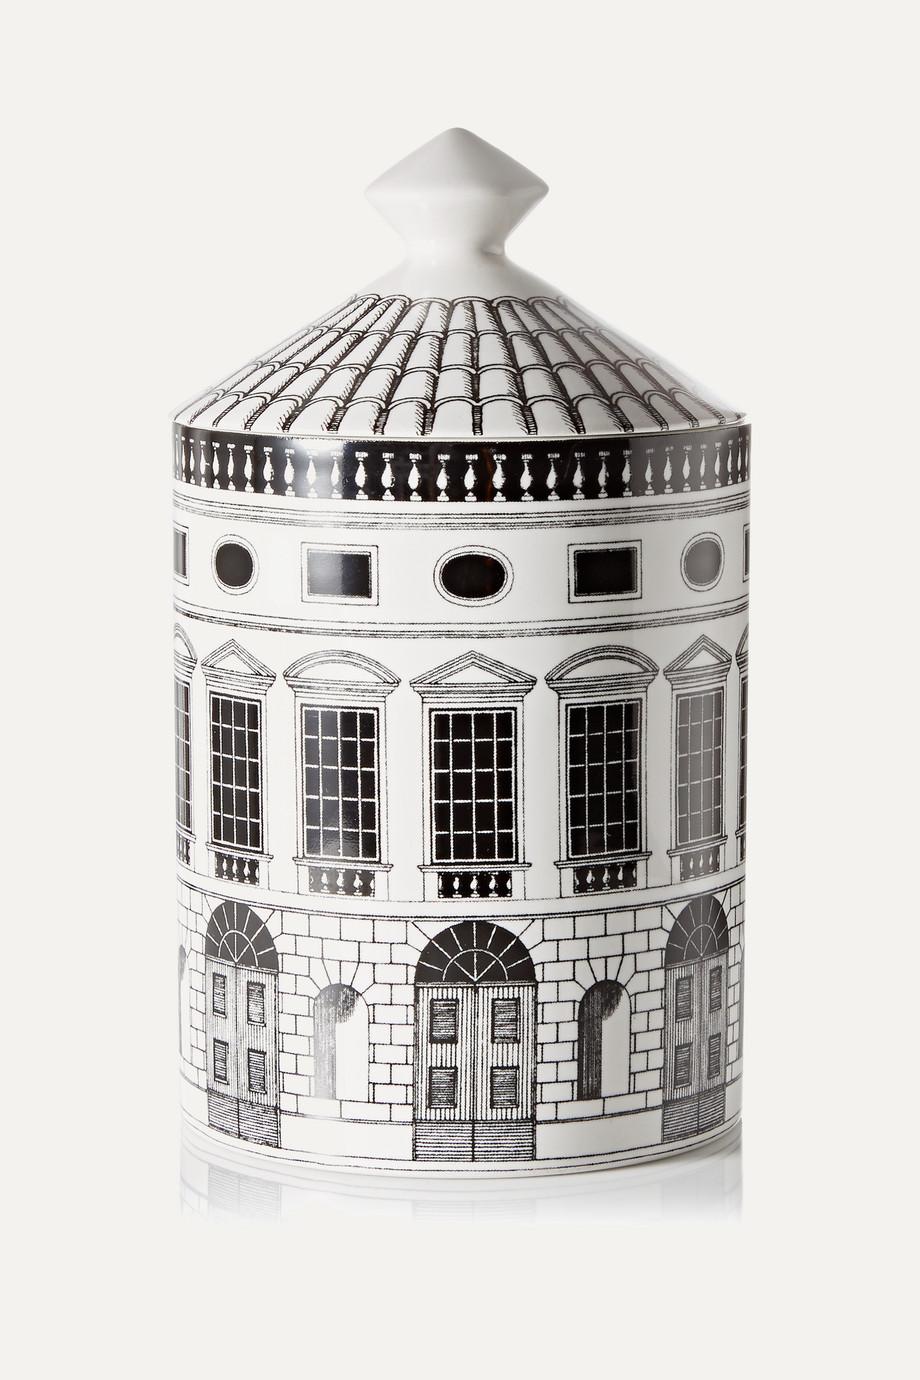 Fornasetti Architettura 百里香、薰衣草和雪松香薰蜡烛, 300g